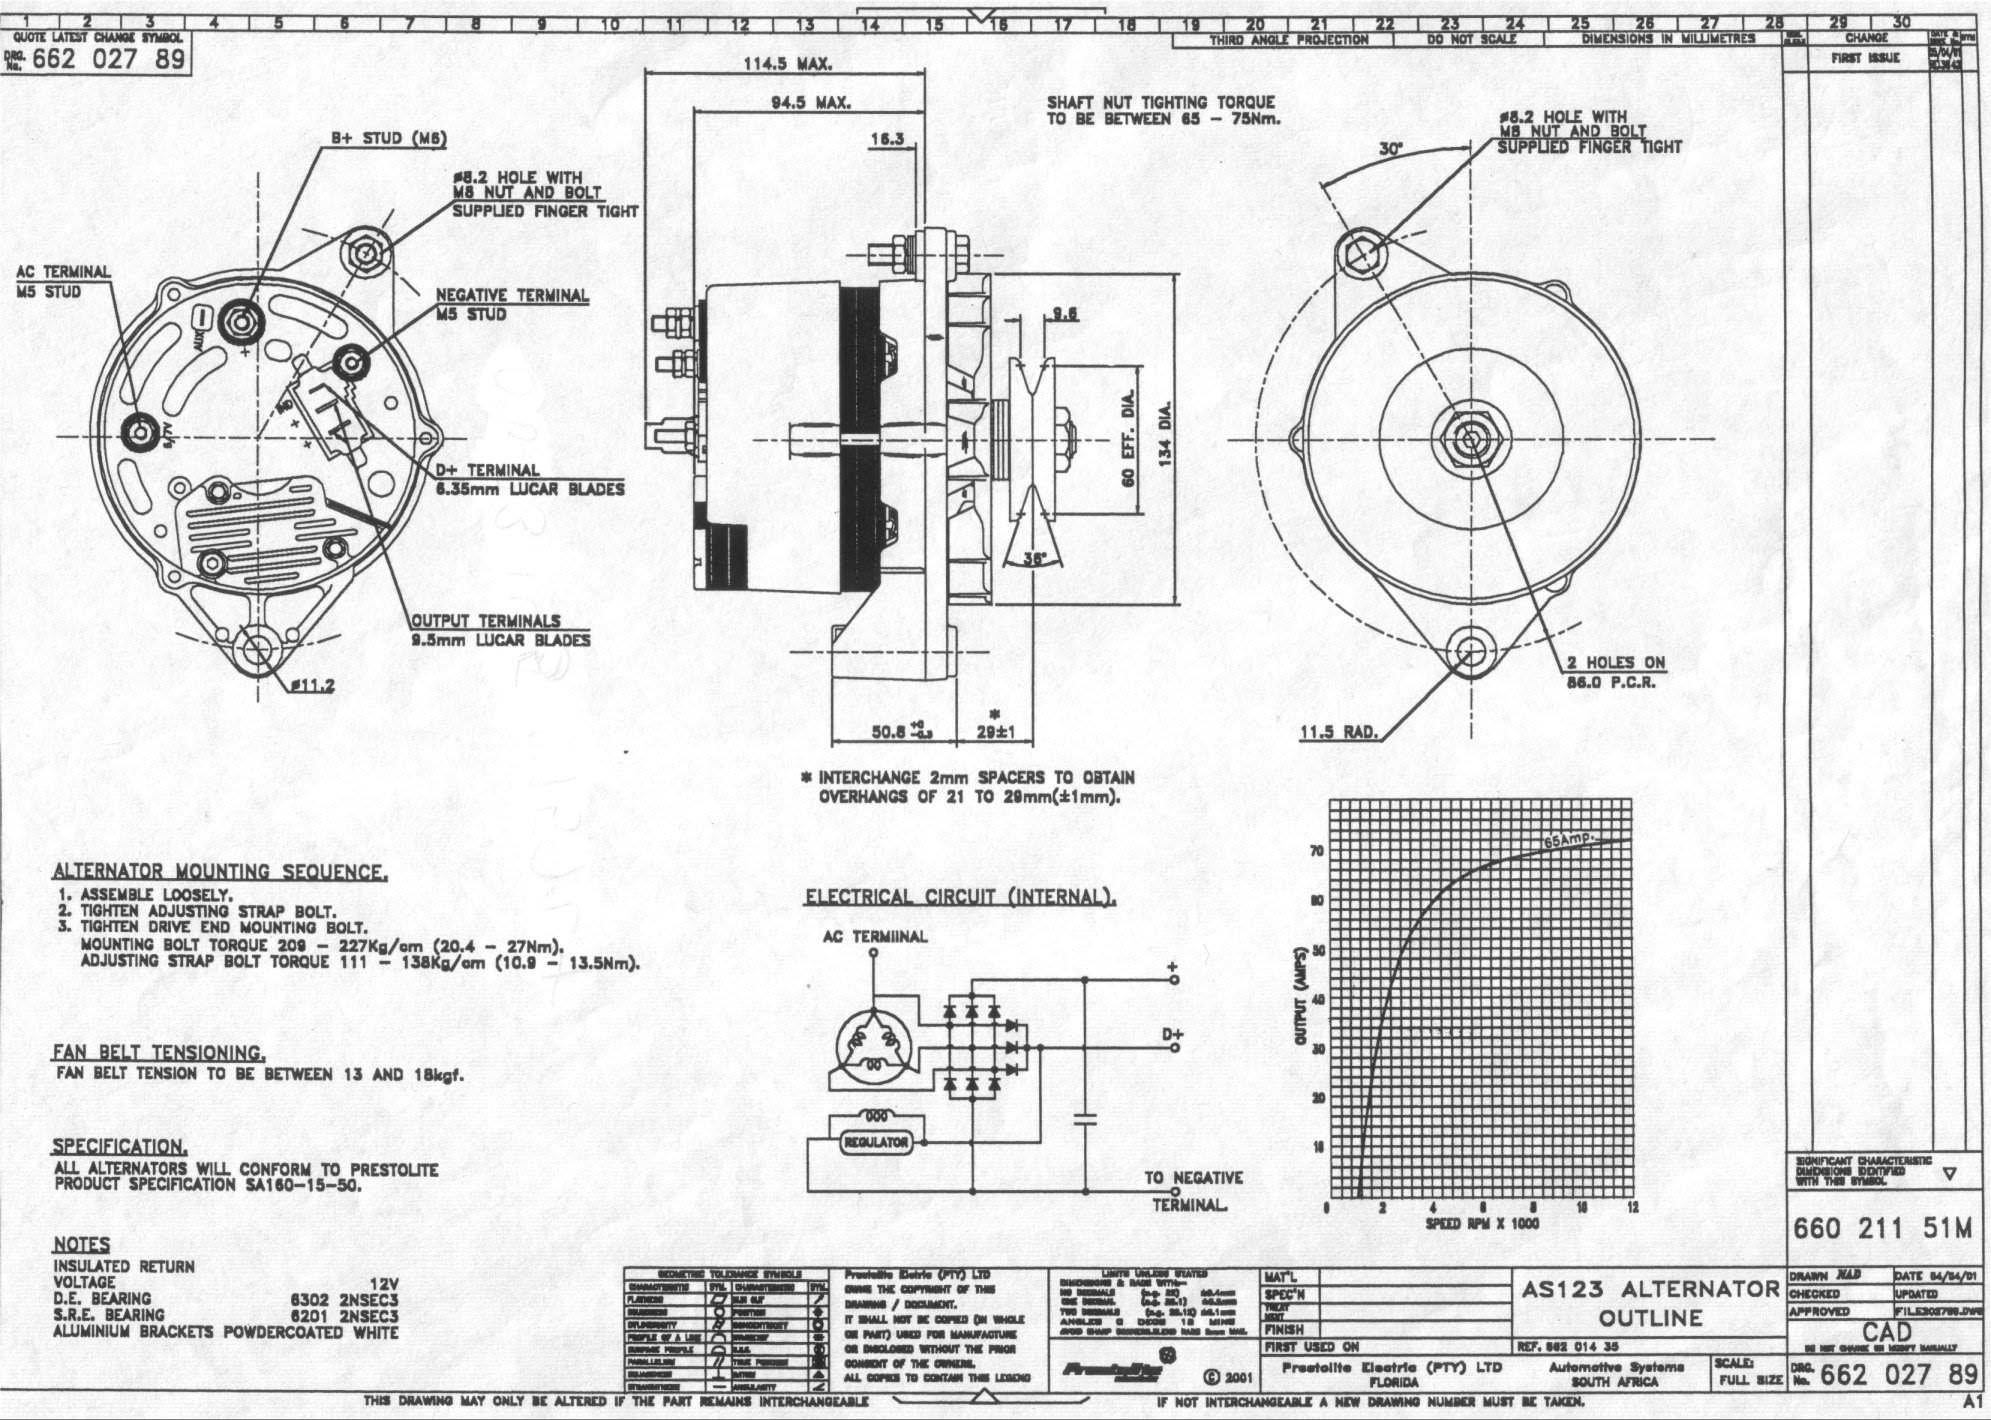 24v alternator wiring diagram 91 honda civic hatchback 24vdc charger